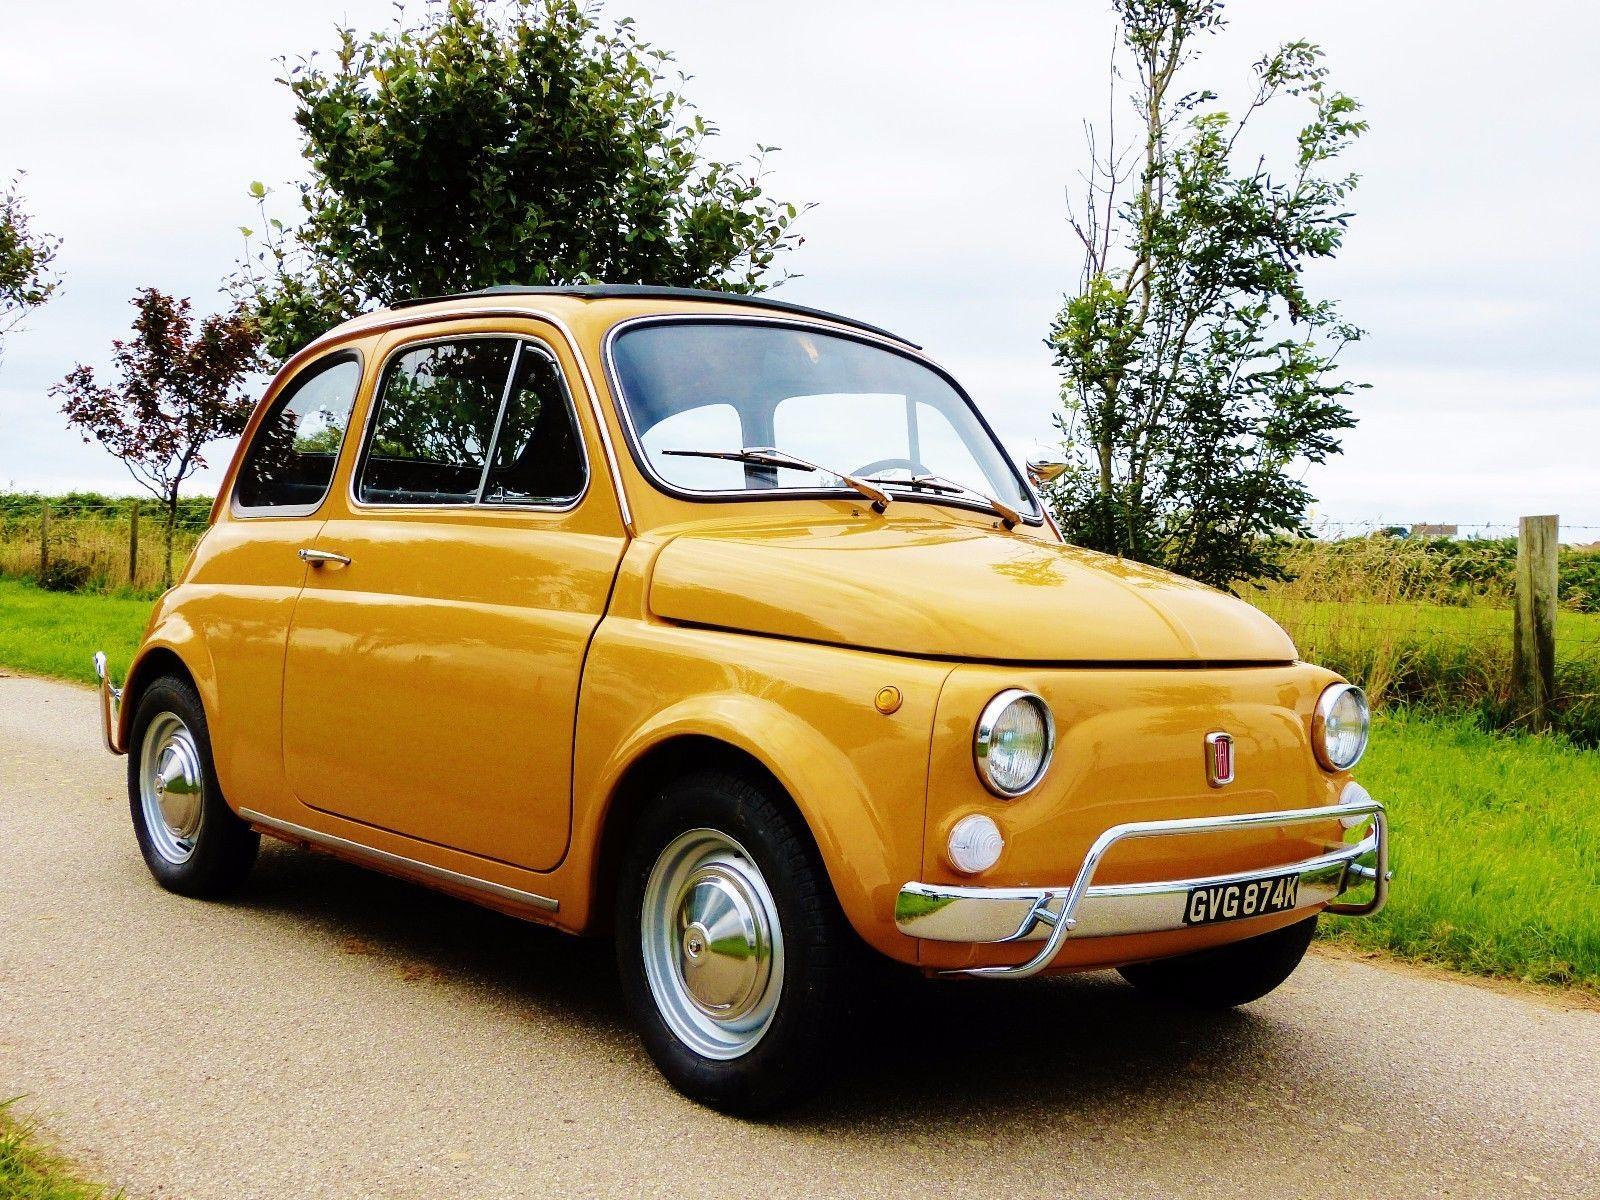 Vintage Classic Fiat 500l 1972 Lusso Fully Restored New Mot Uk